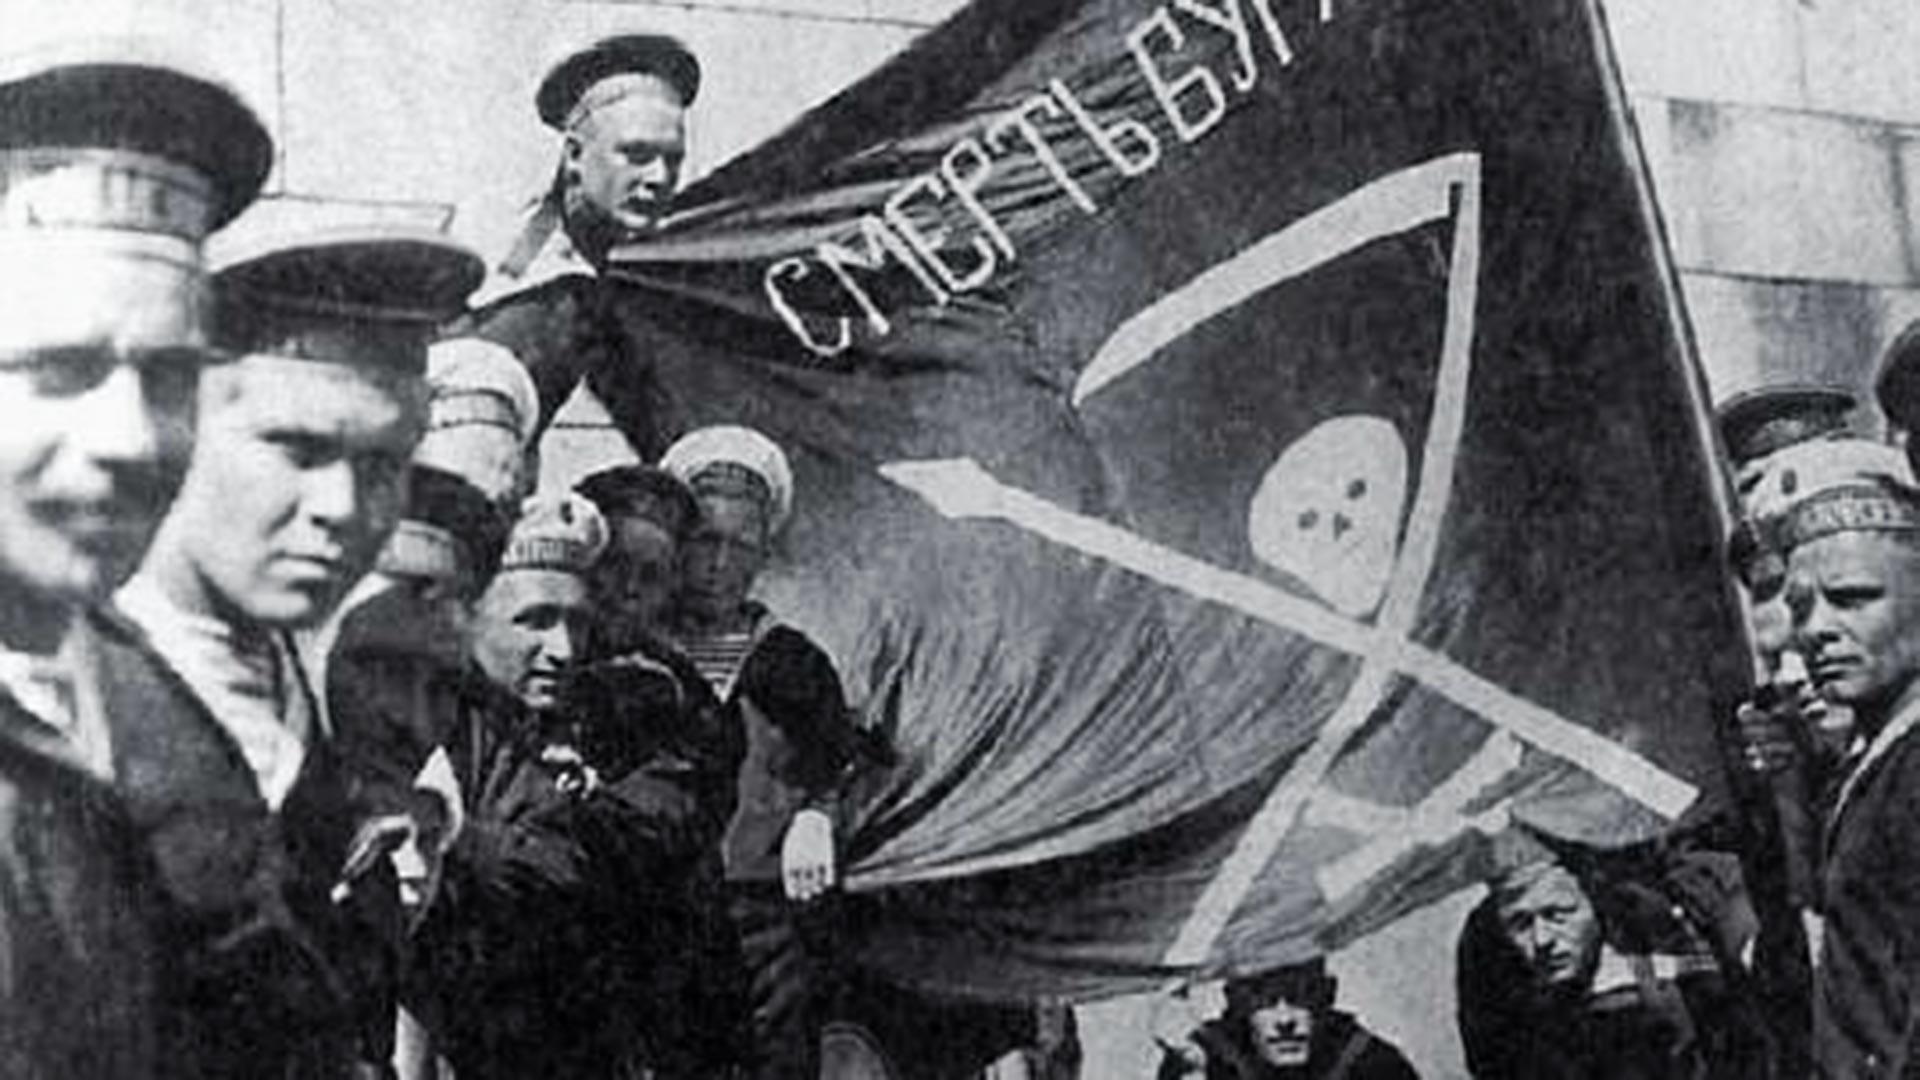 Les marins du cuirassé Petropavlovsk à Helsinki en 1917